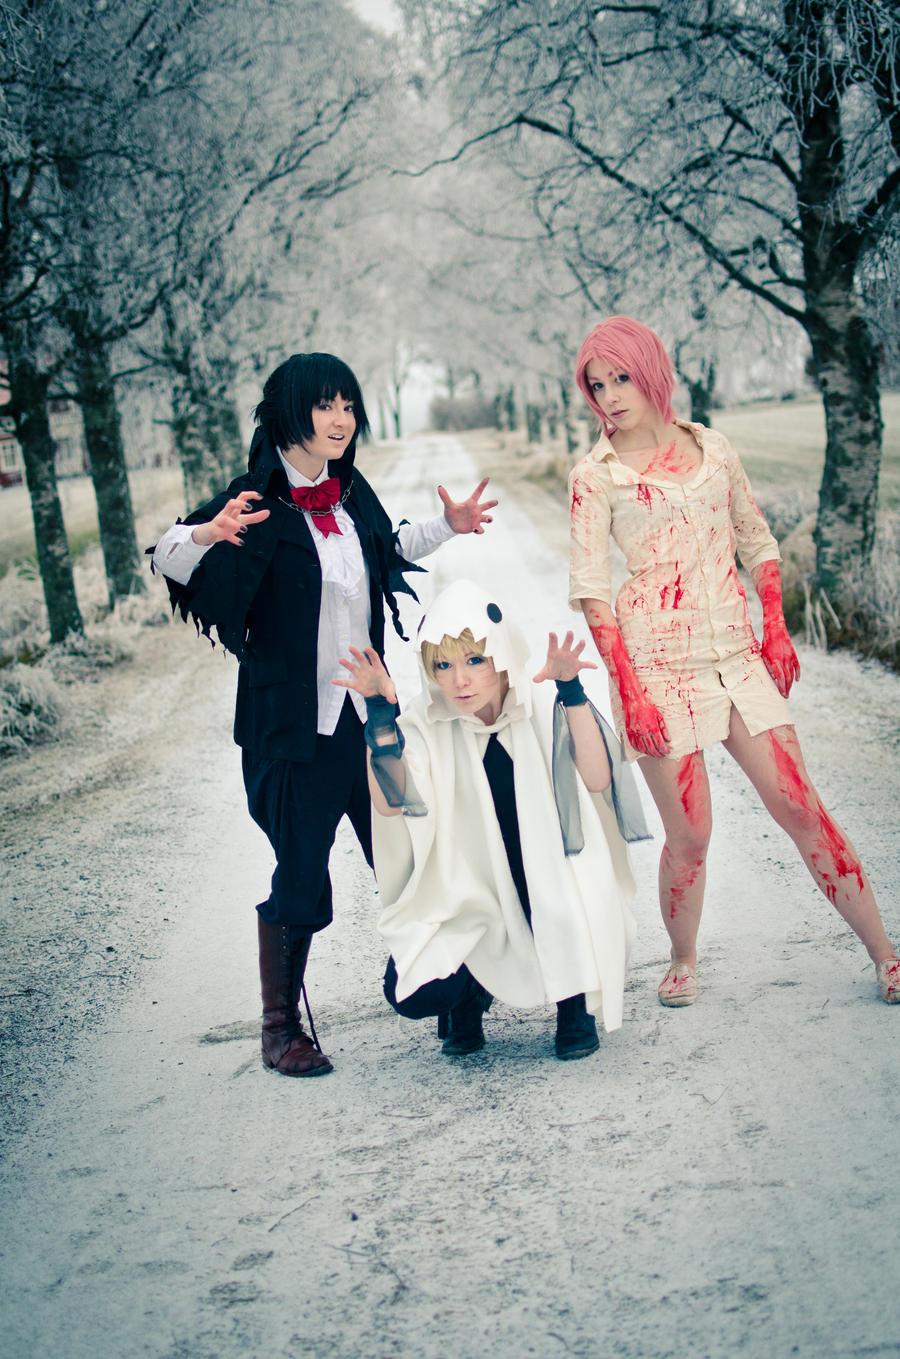 Team 7 - Happy Halloween! by Shiroiaisu